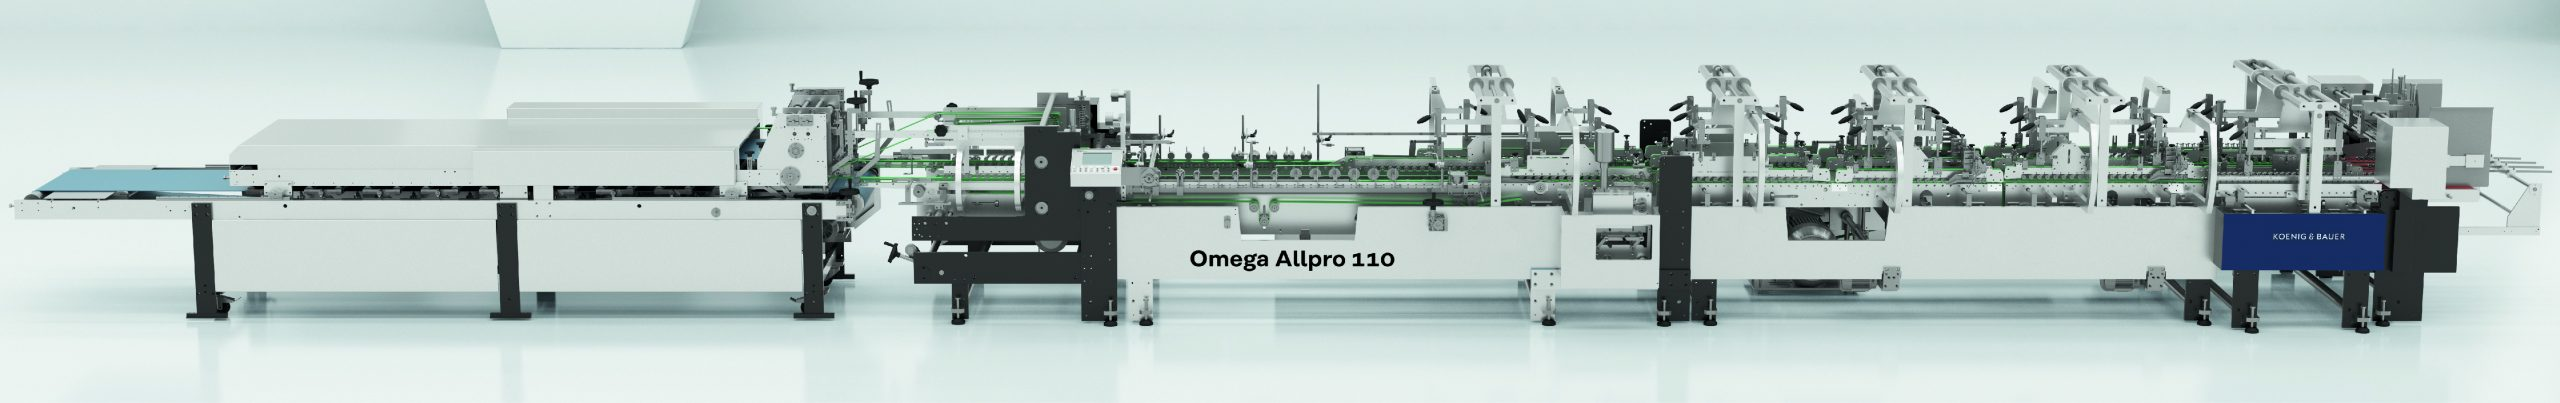 Allpro 110